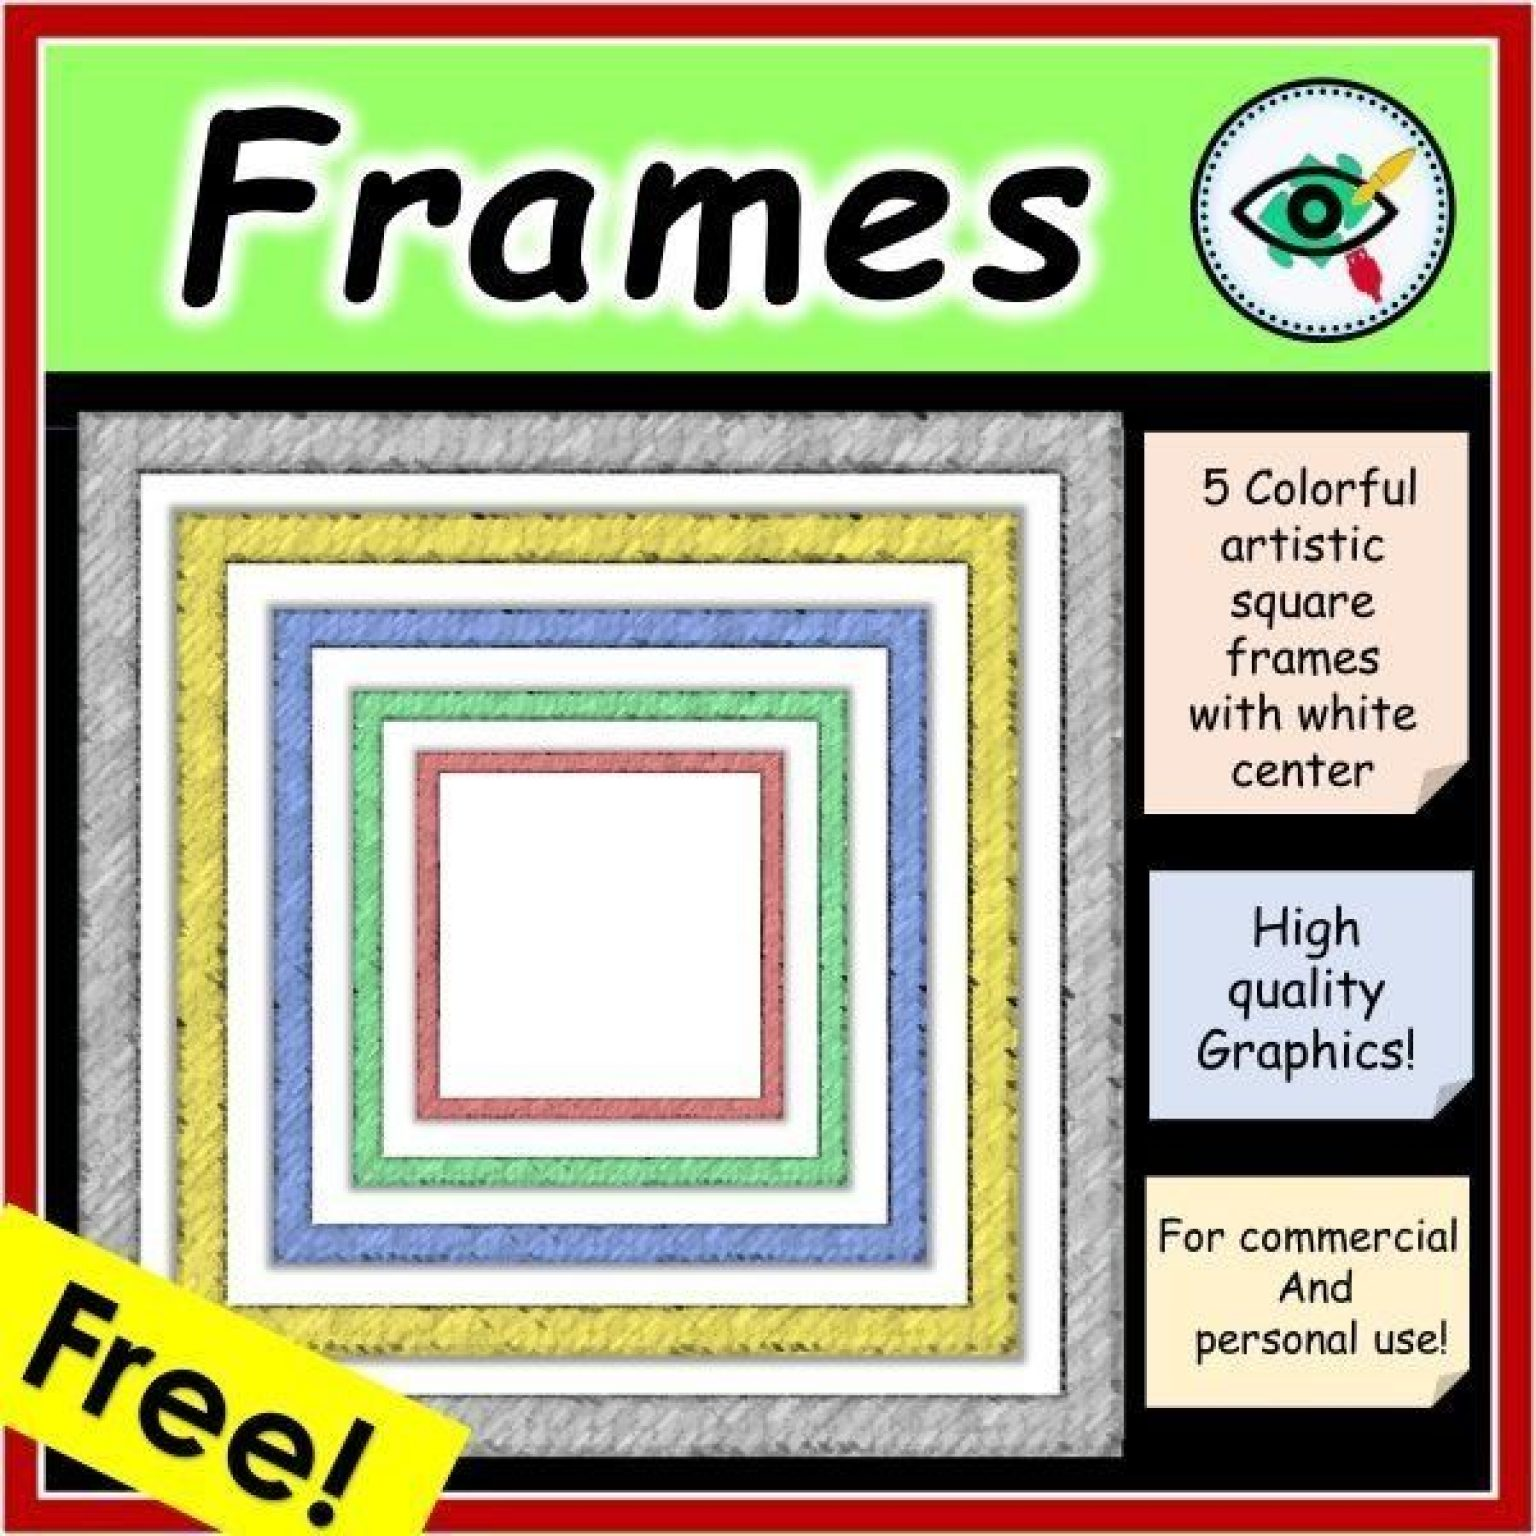 frames-free-title1